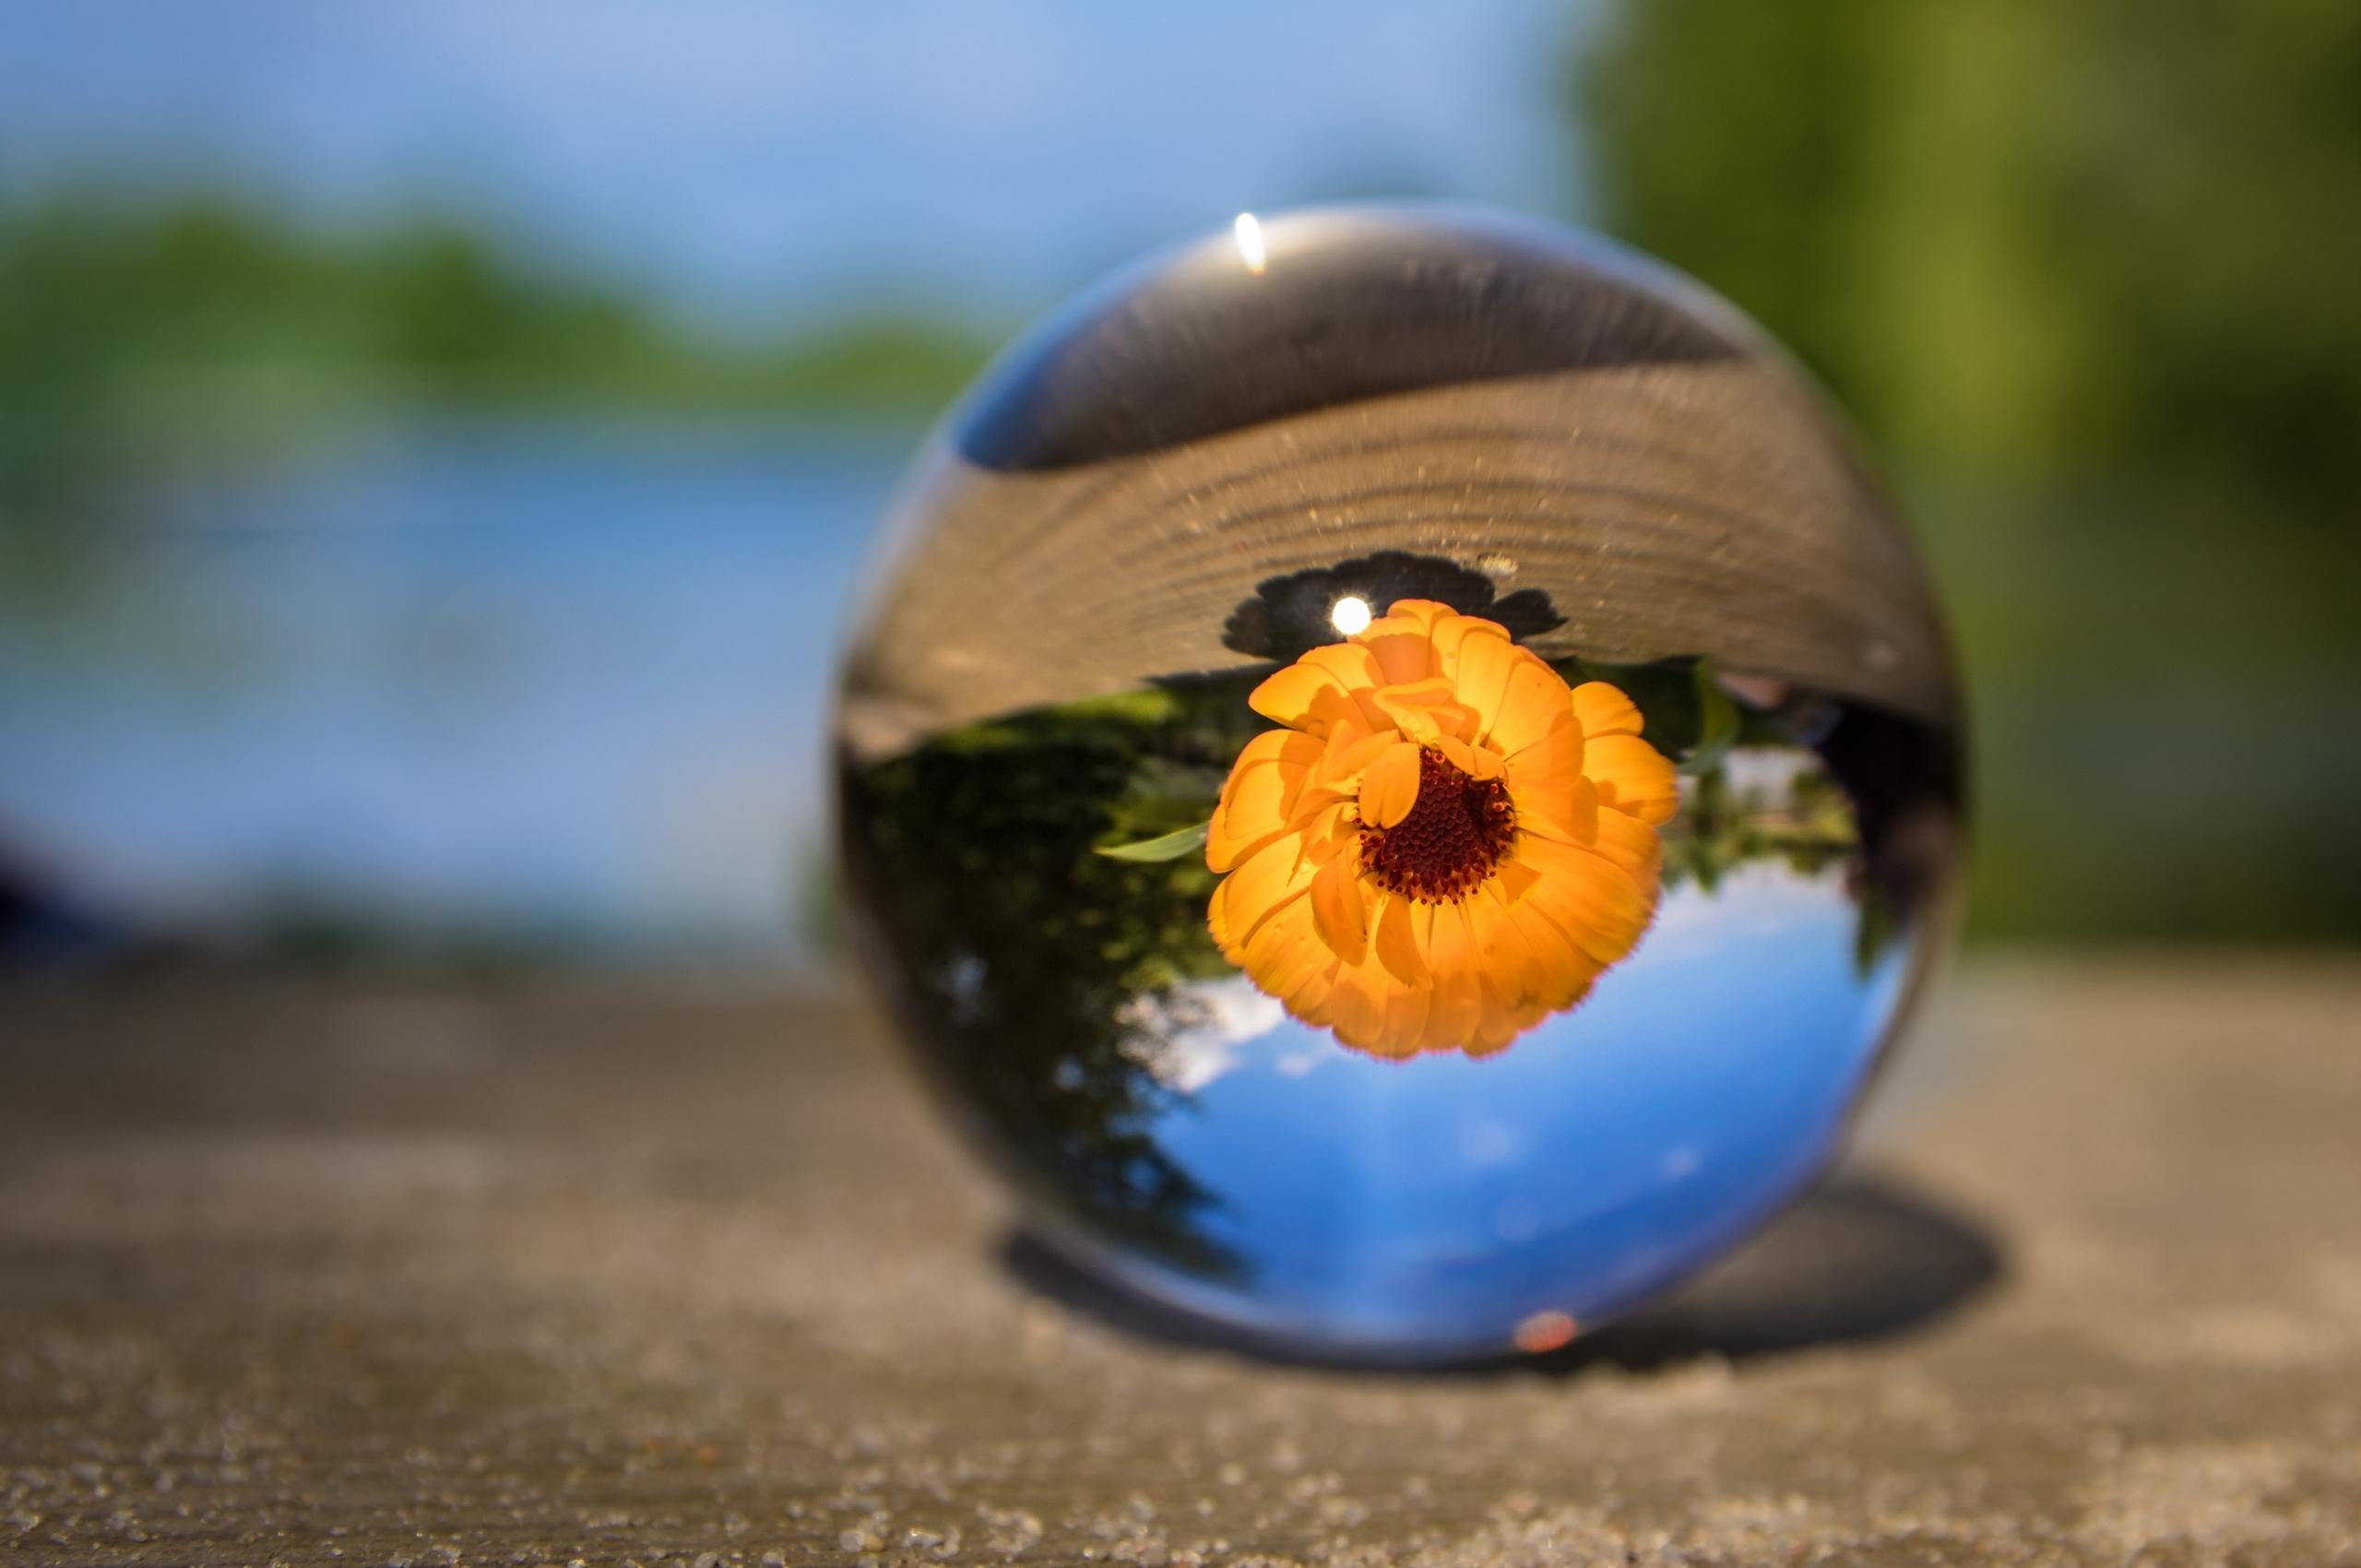 2560x1700 Flower Ball Chromebook Pixel Hd 4k Wallpapers Images